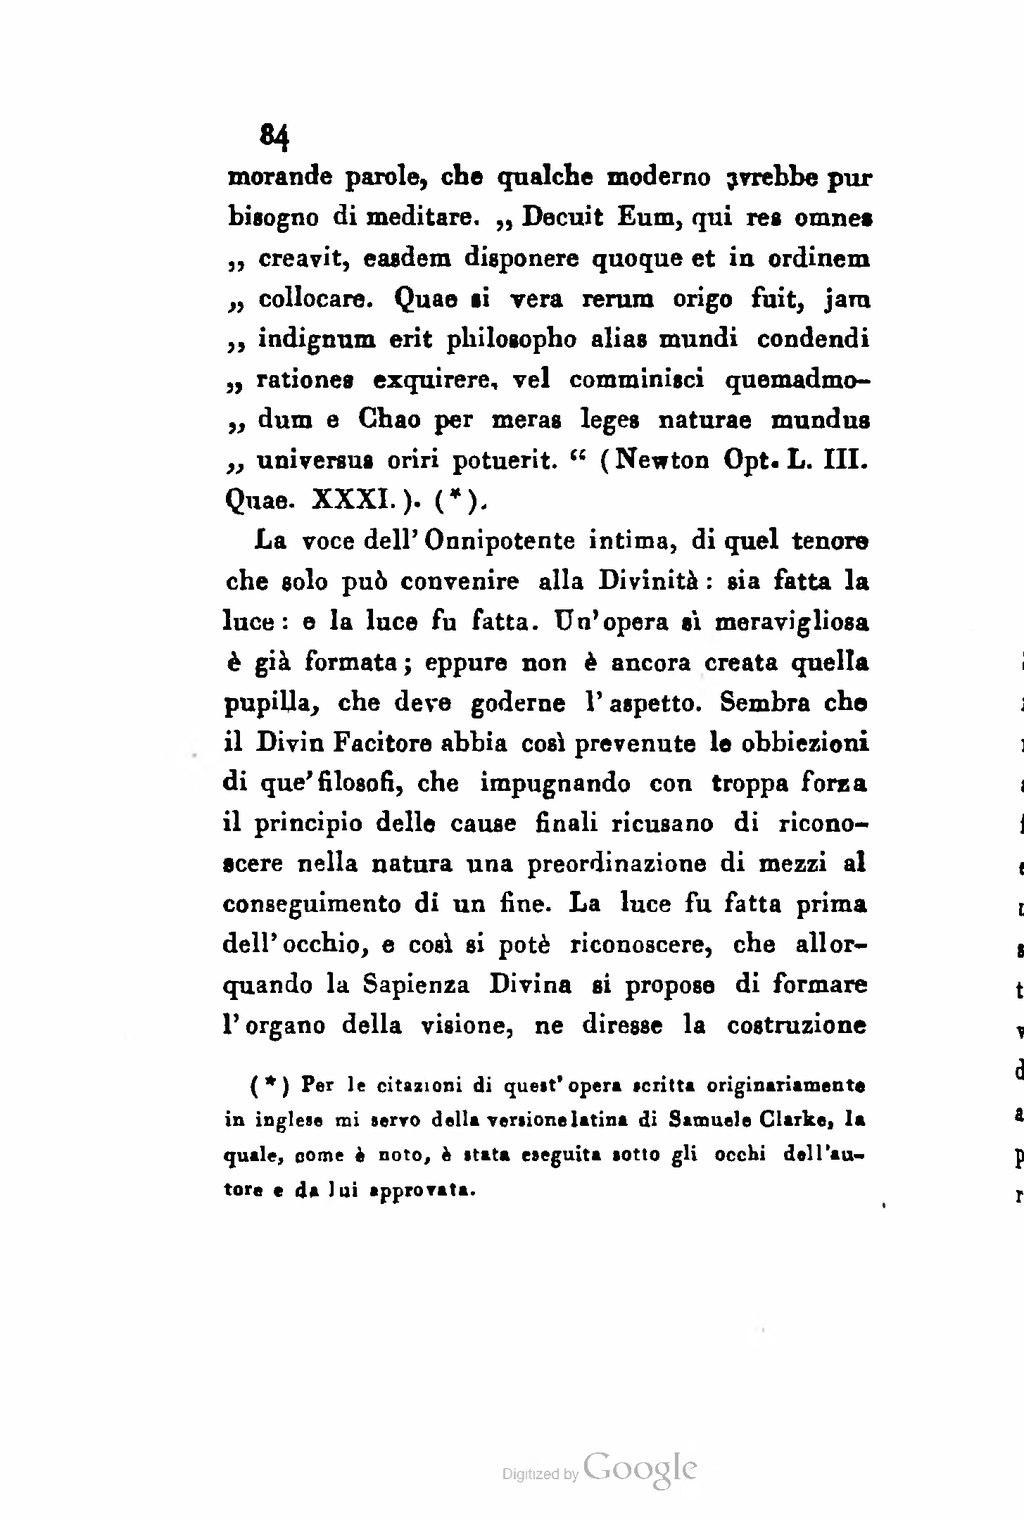 Pagina Piola Lettere Di Evasio Ad Uranio Djvu 90 Wikisource